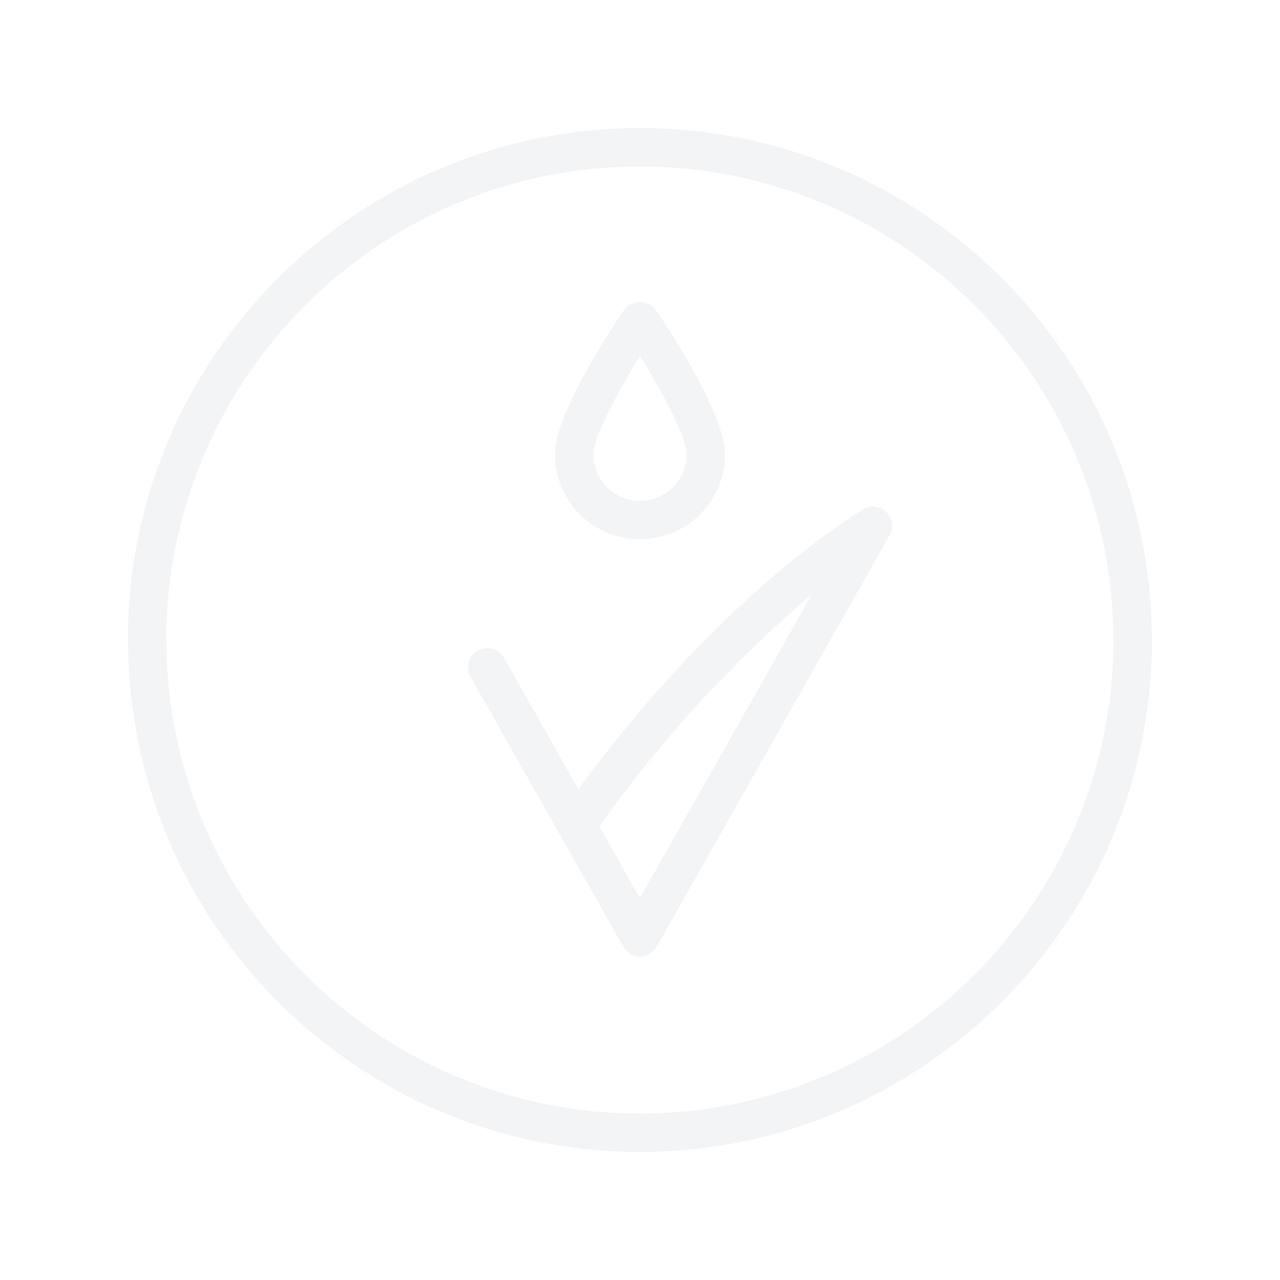 ROBERTO CAVALLI Paradiso 50ml Eau De Parfum Gift Set